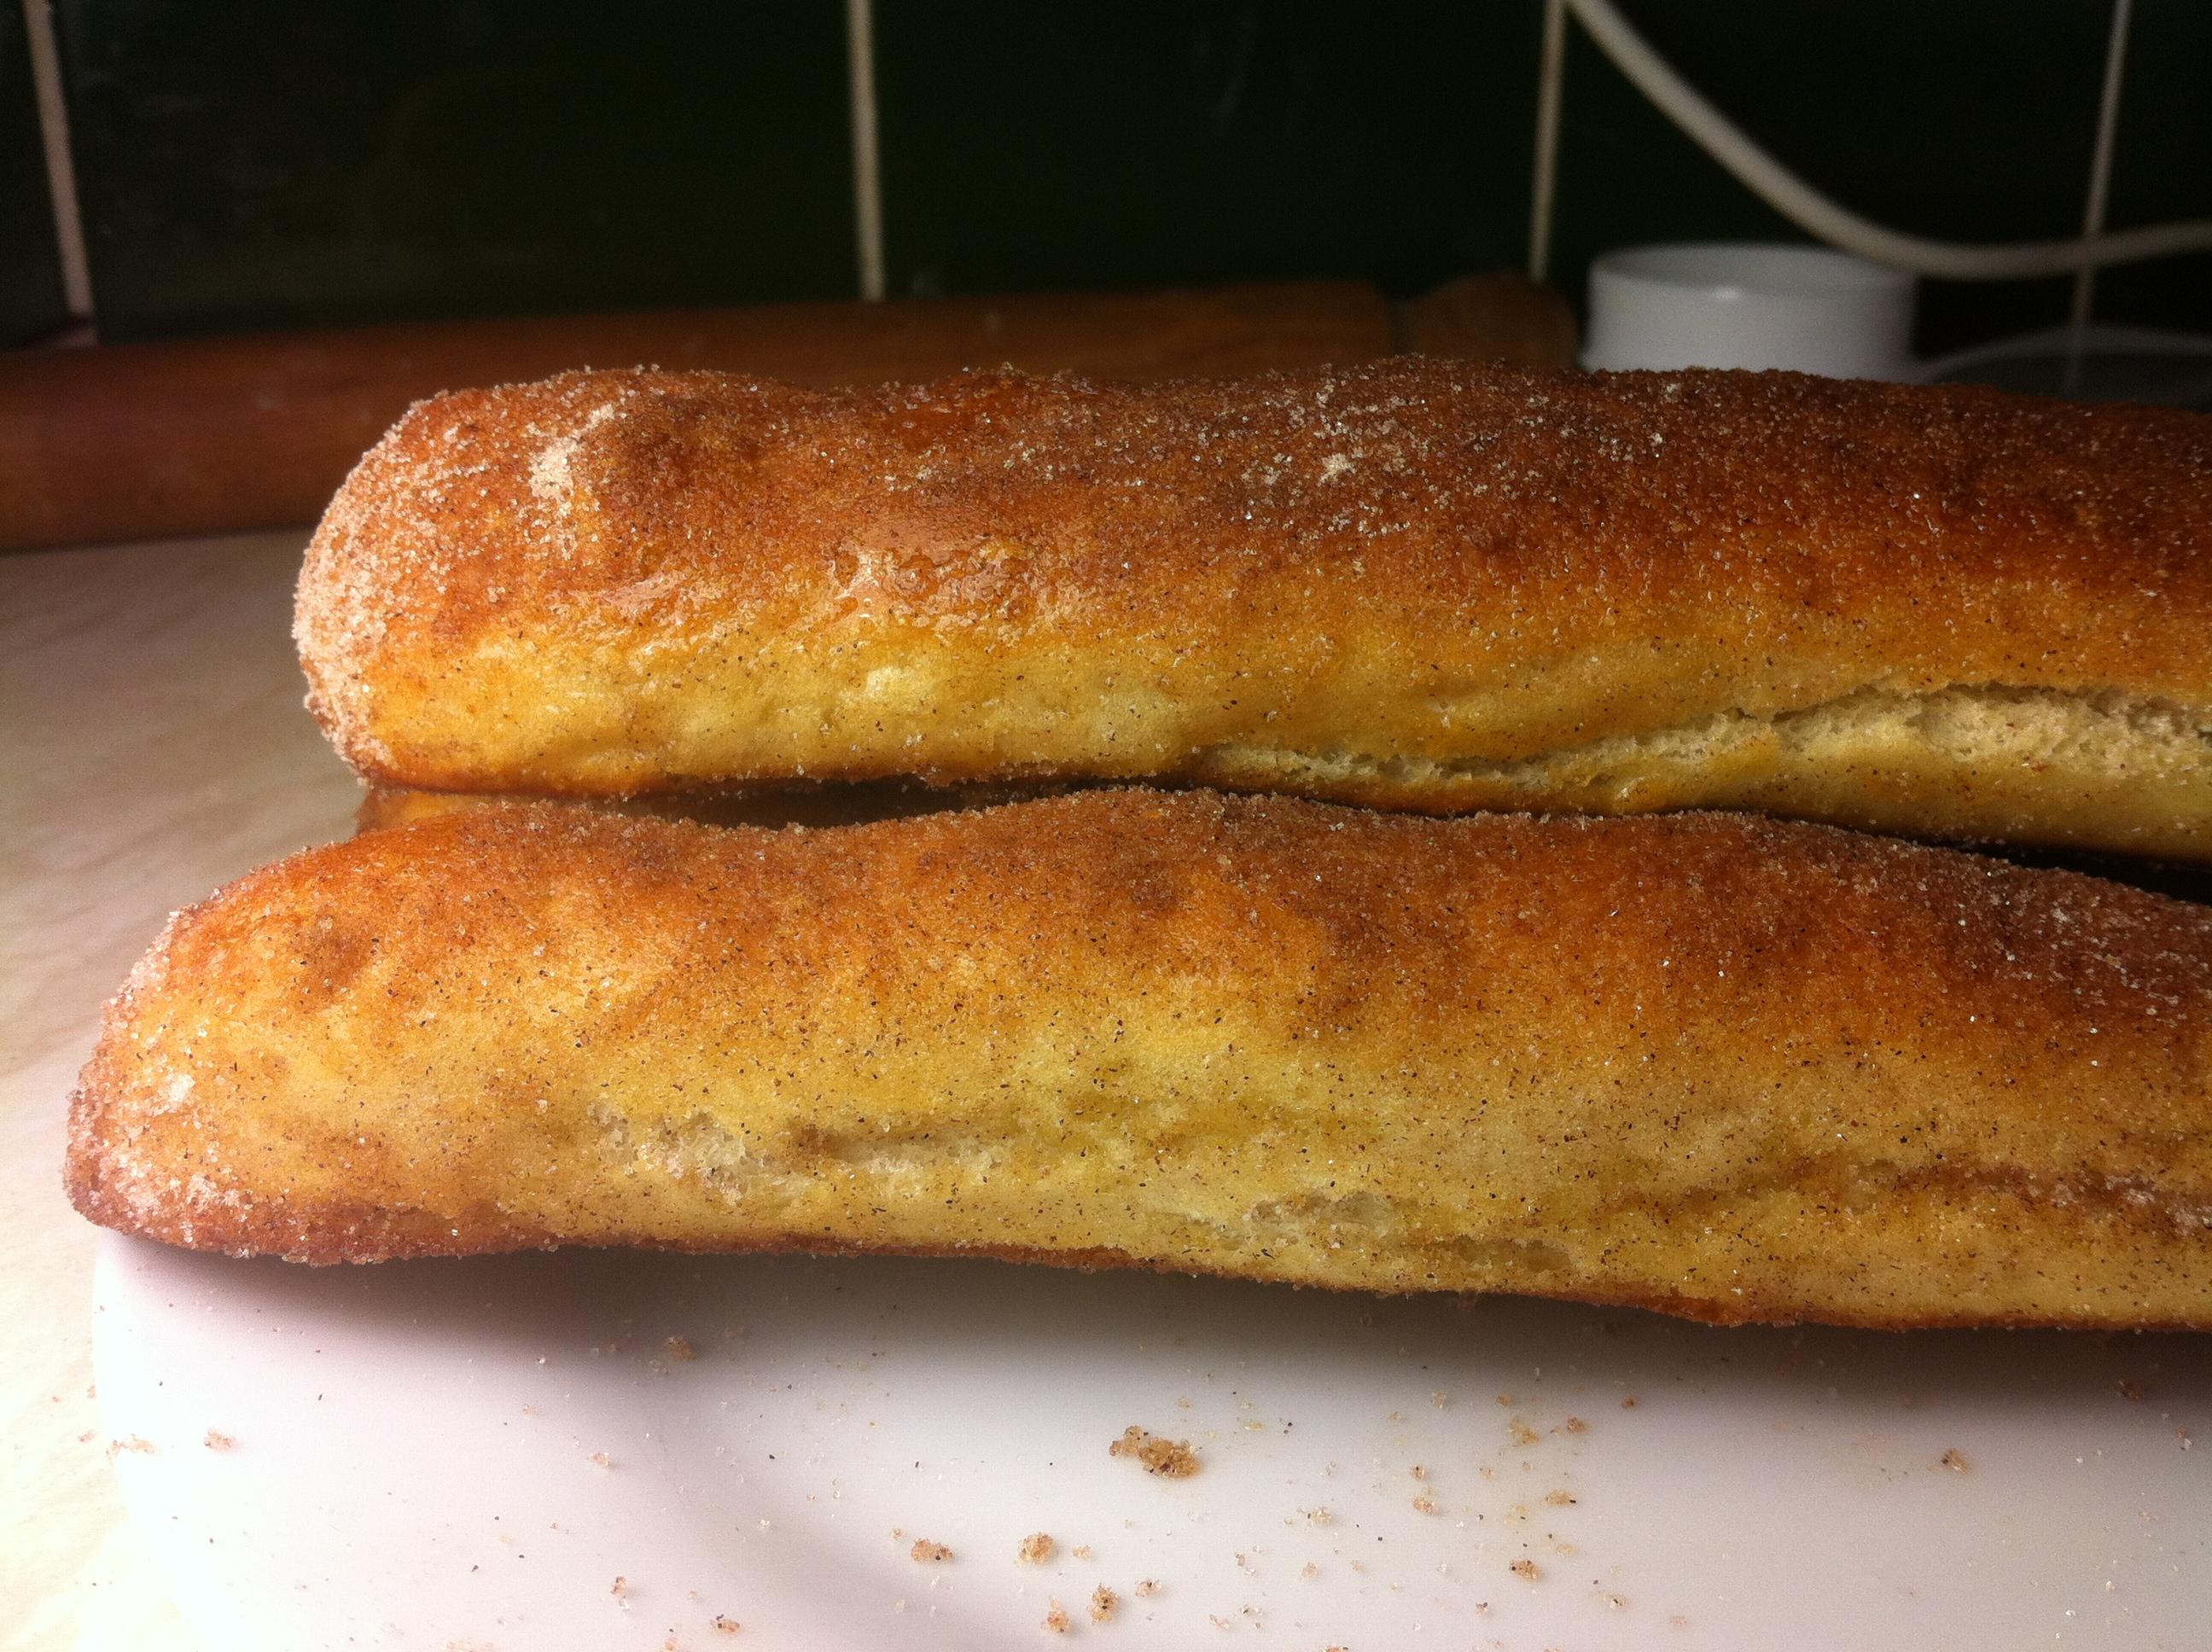 Soft pretzel sticks baked at home